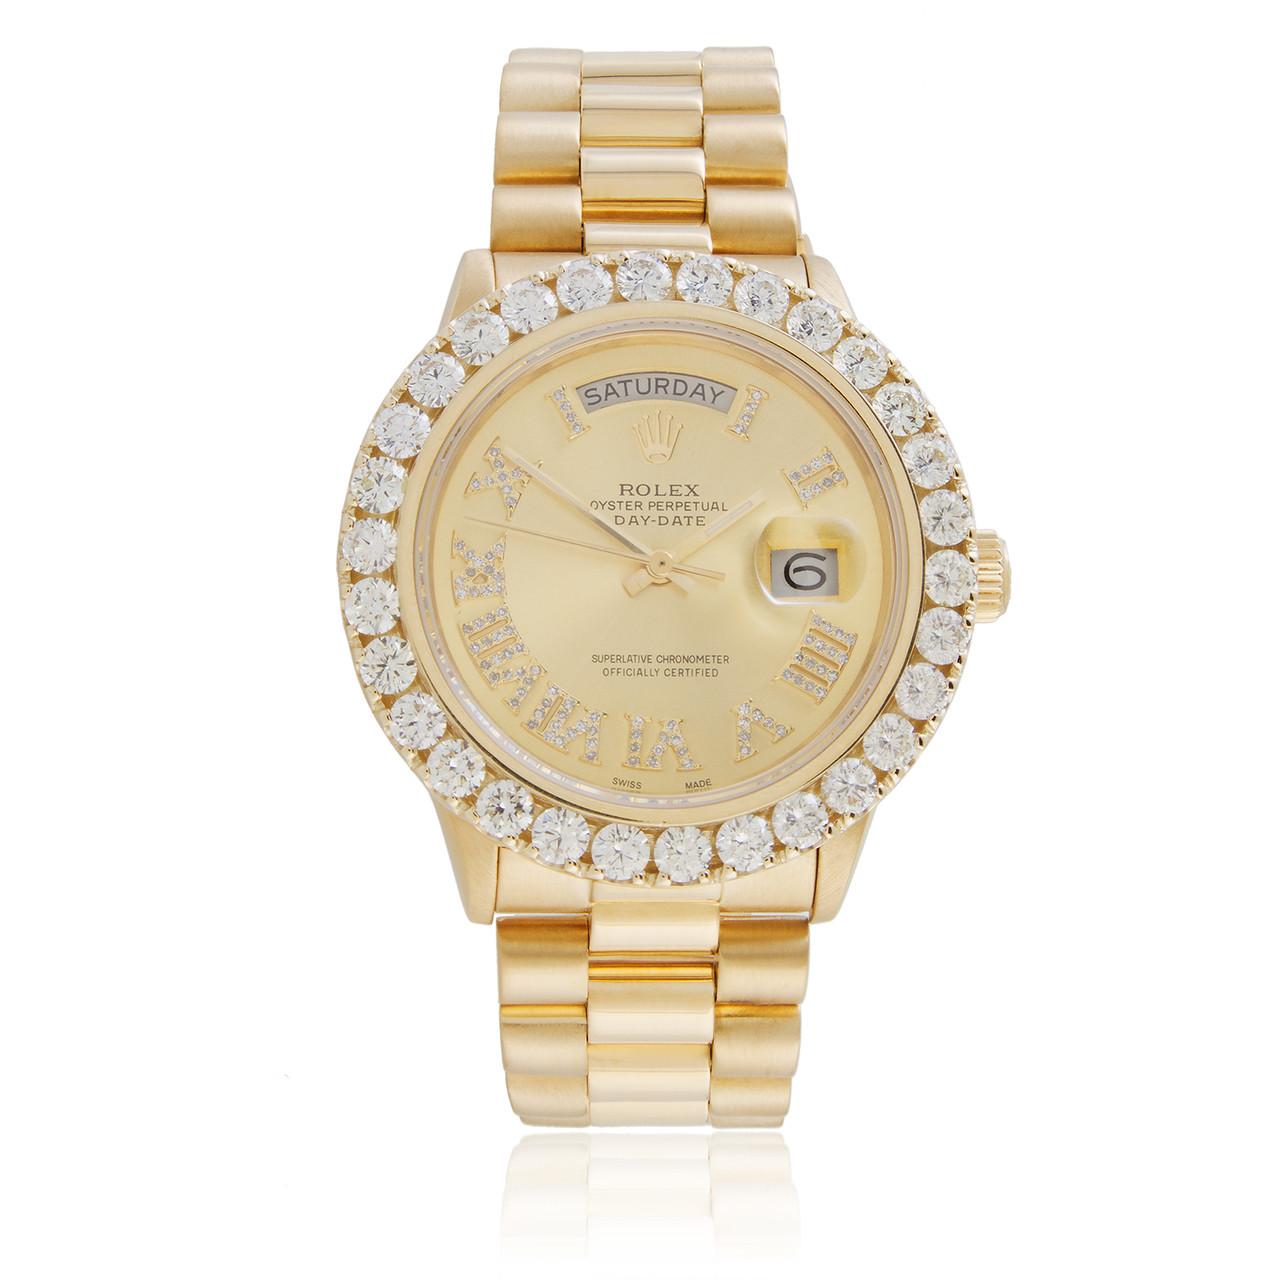 Rolex Day Date 18k Yellow Gold President 65ct Diamond Bezel Automatic Mens Watch